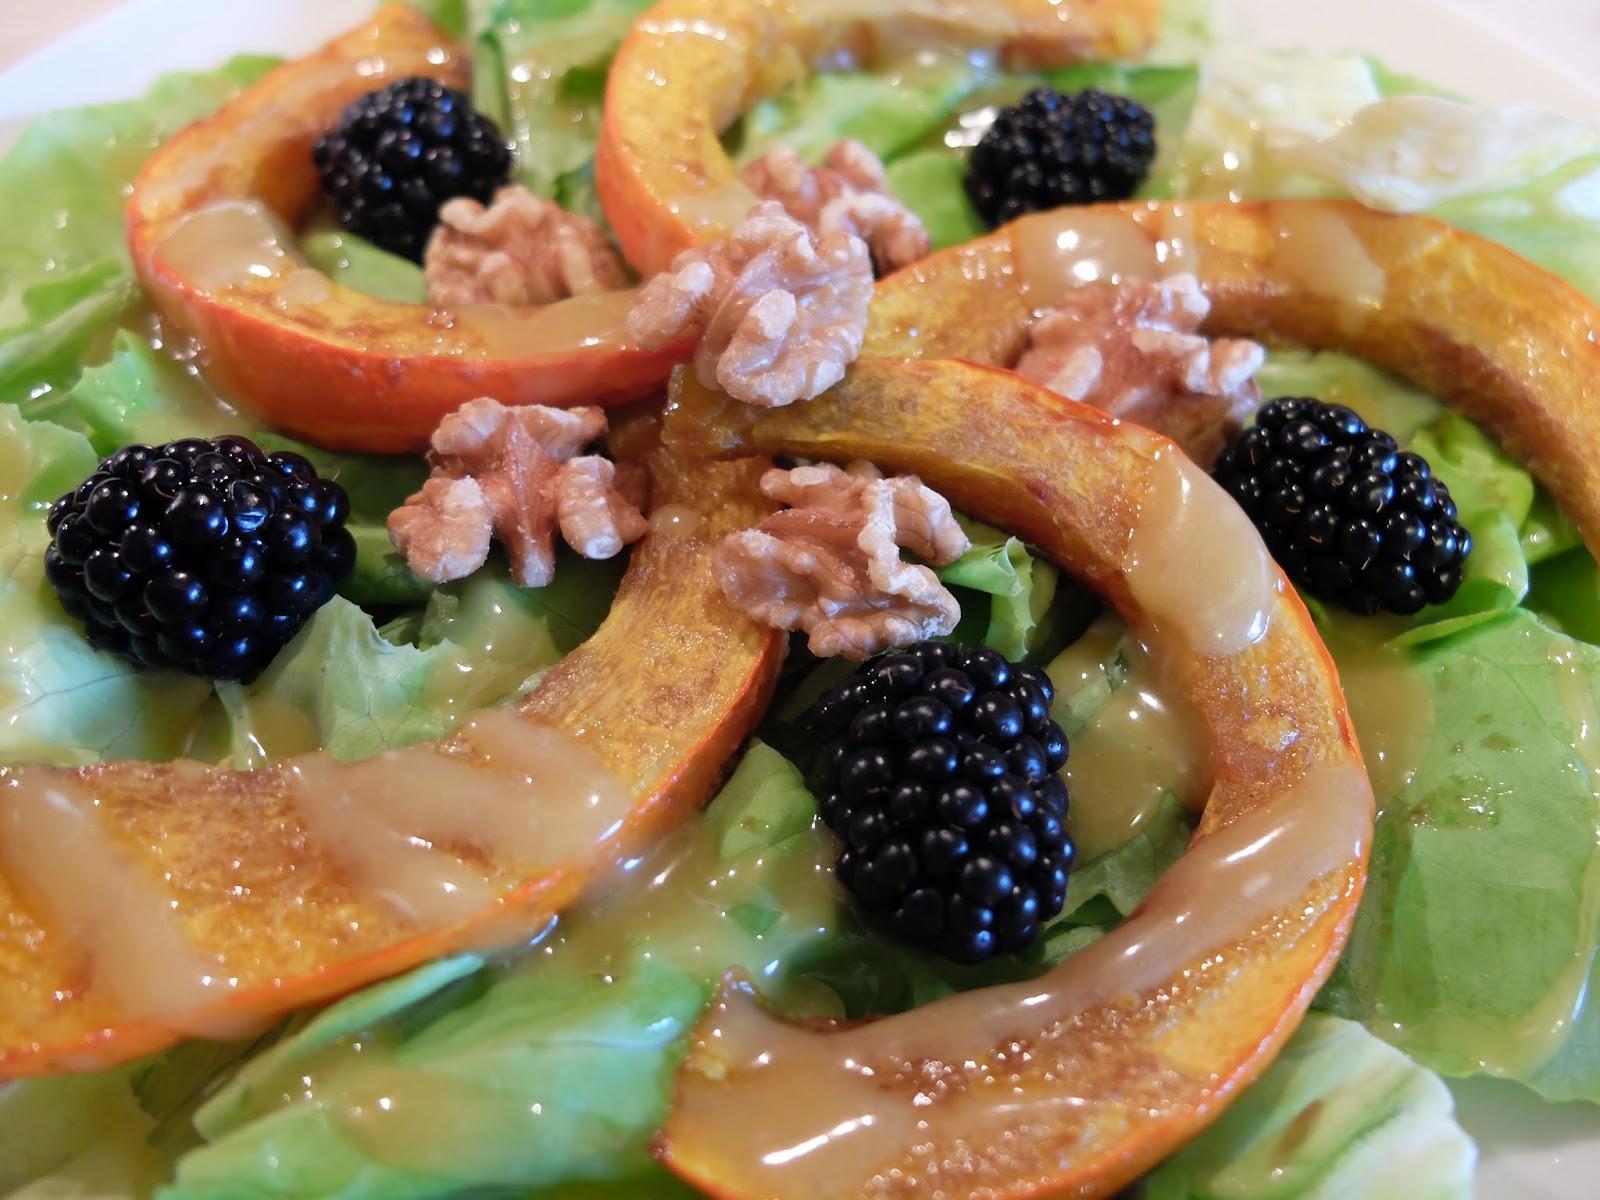 Kopfsalat mit Kürbisspalten vegan